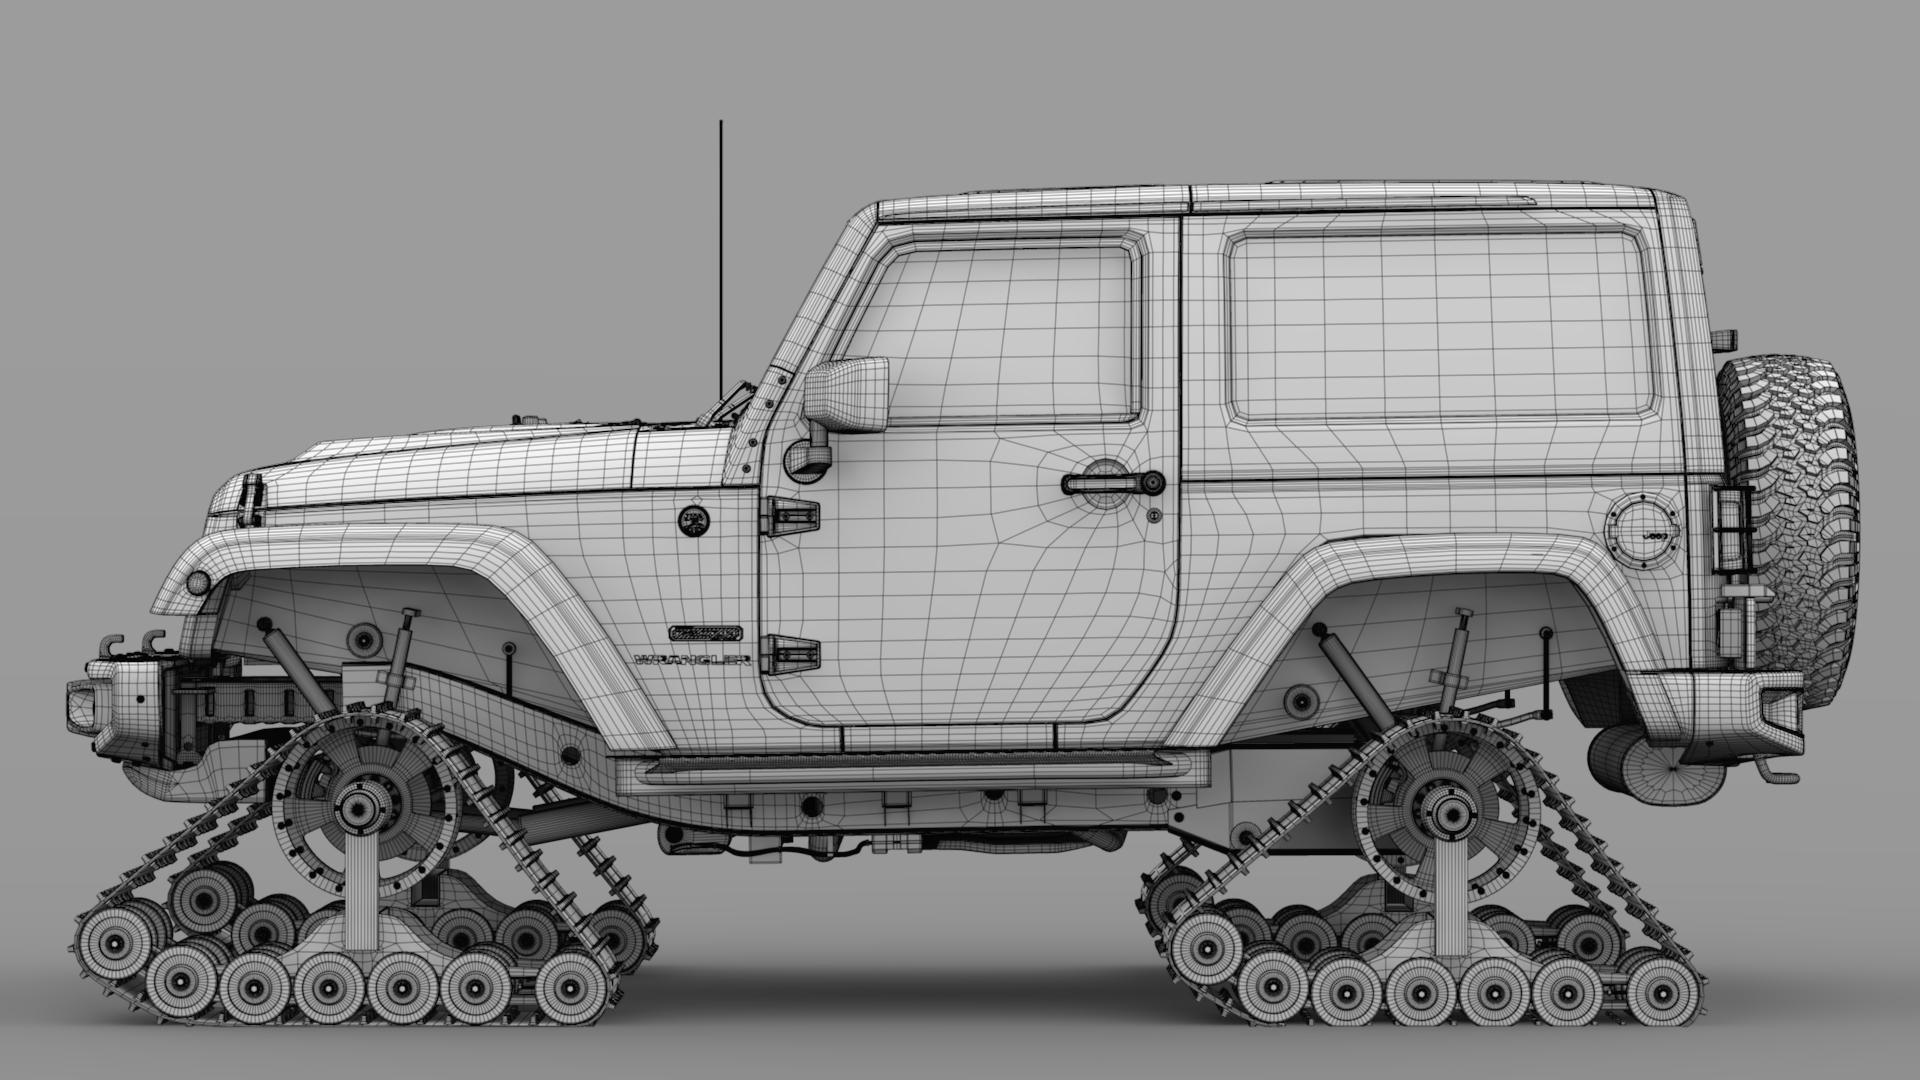 jeep wrangler crawler rubicon recon jk 2017 3d model max fbx c4d lwo ma mb hrc xsi obj 276923